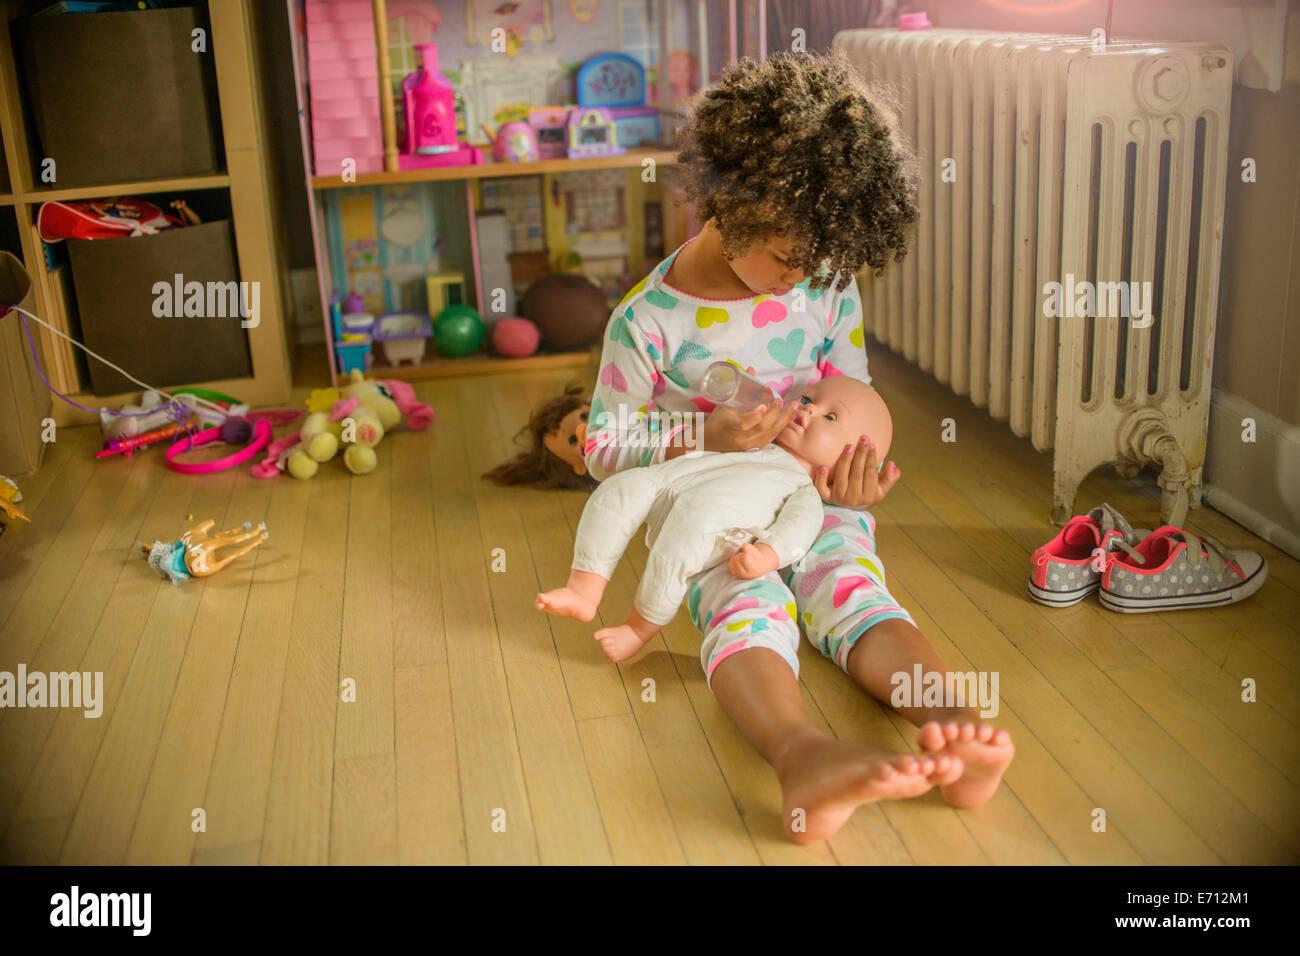 Girl sitting on playroom floor feeding doll - Stock Image